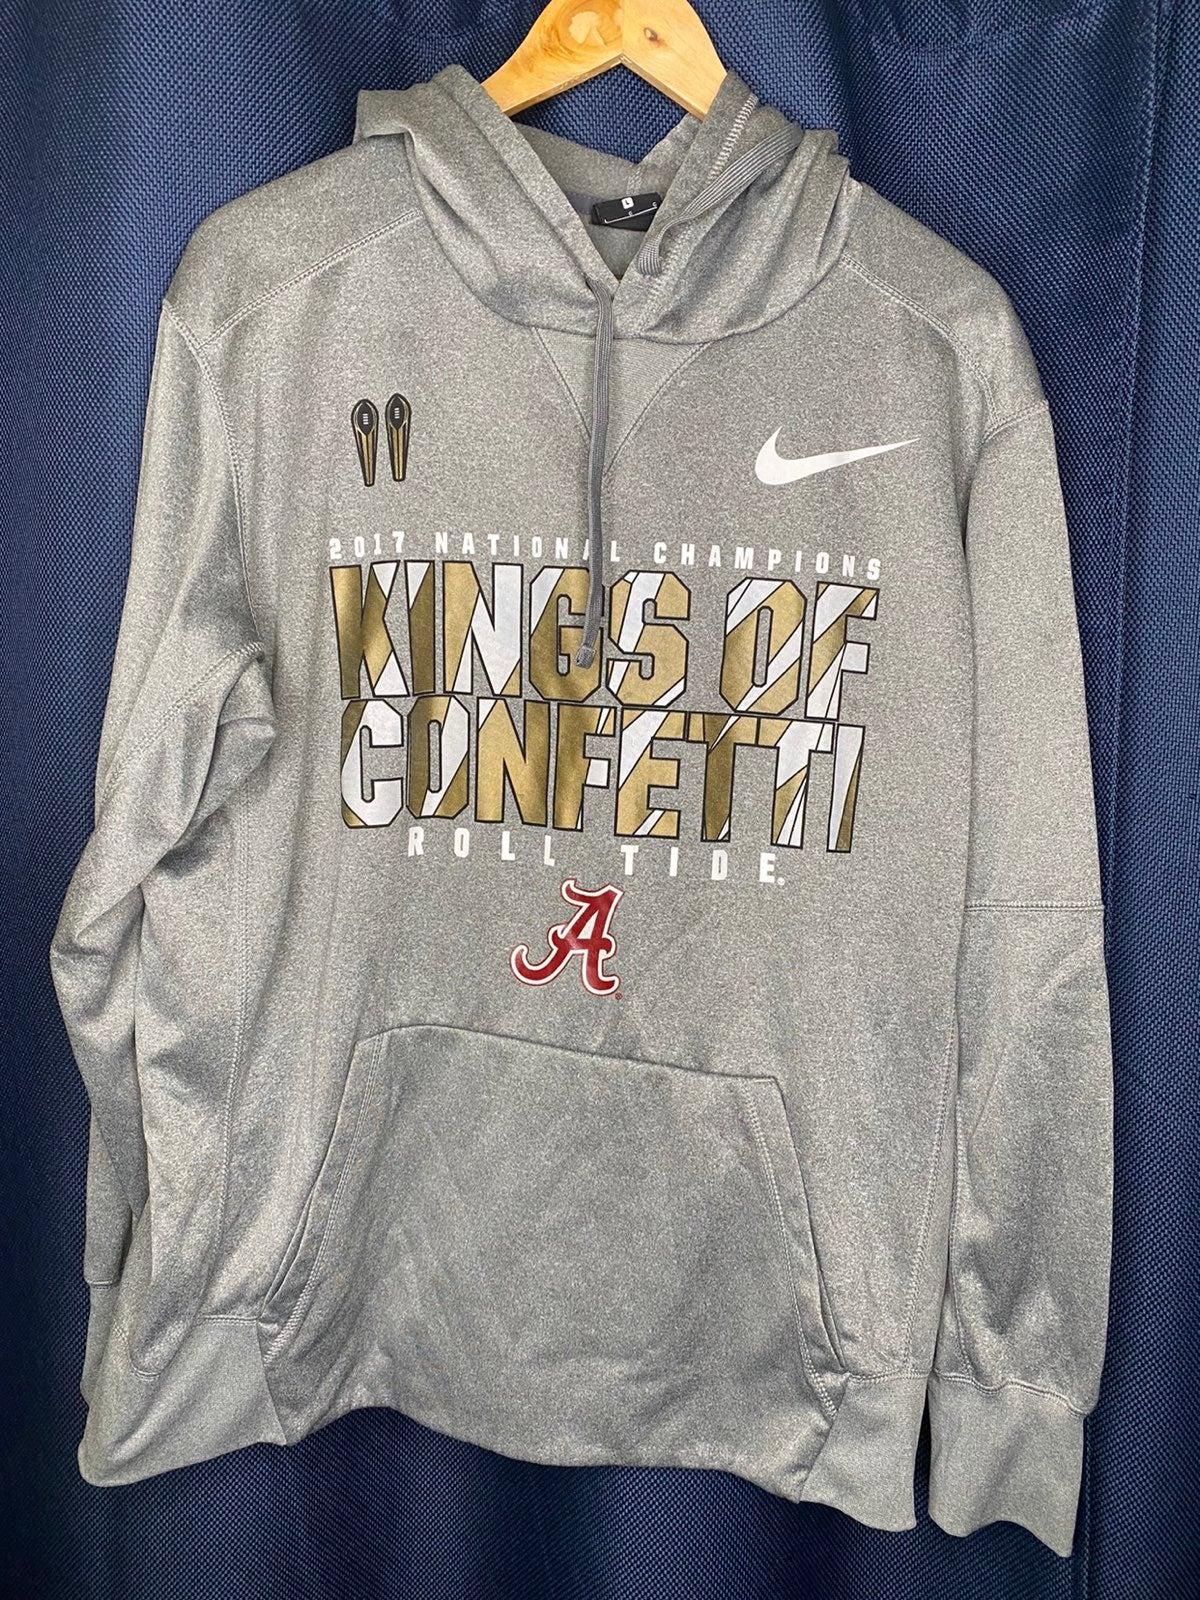 Alabama 2017 National Champs Nike Hoodie